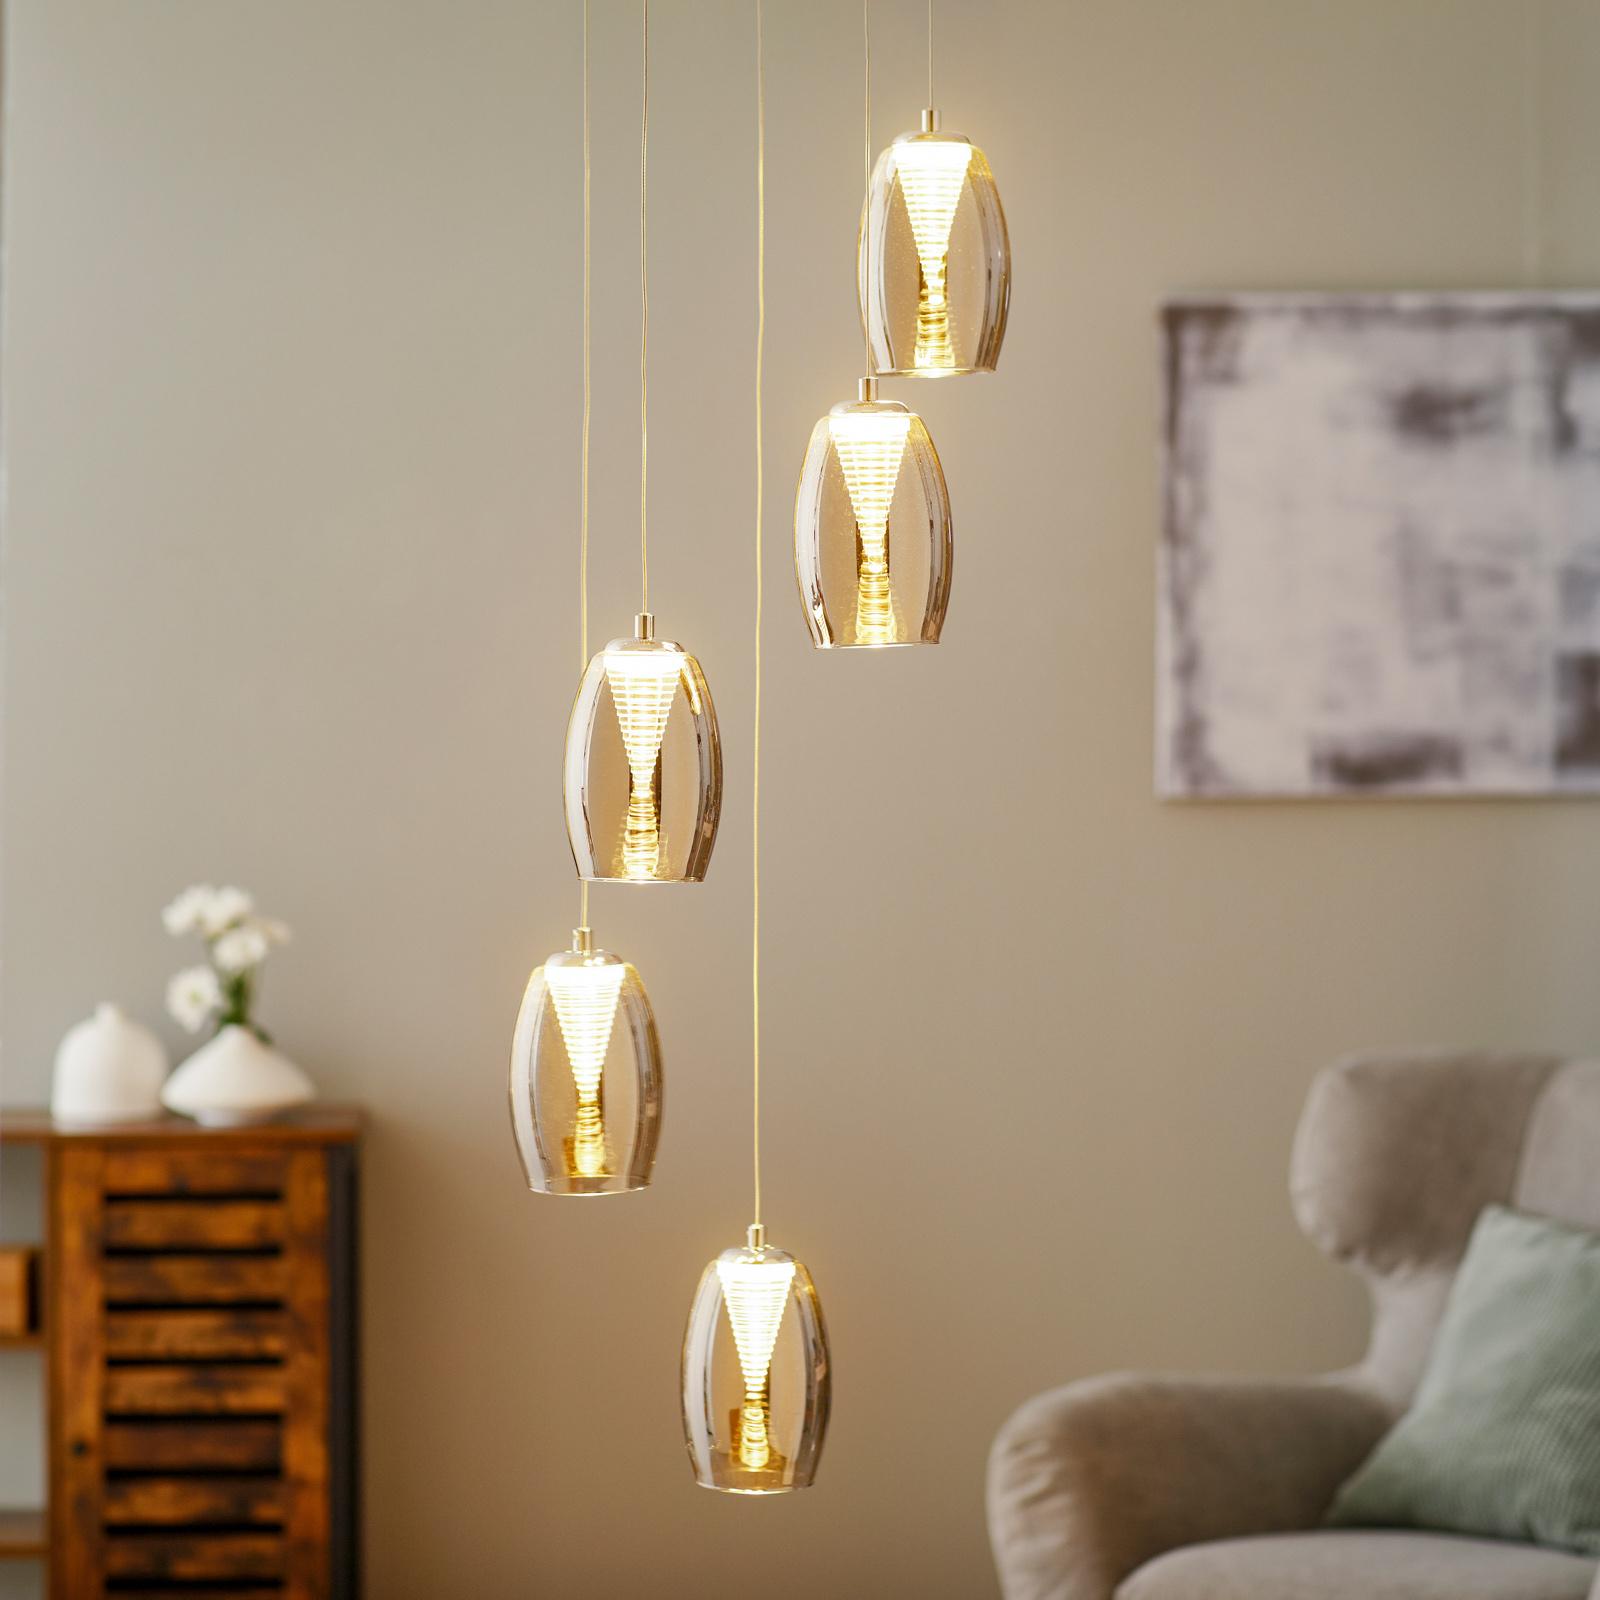 LED-hänglampa Metropolis rökglas 5 lampor